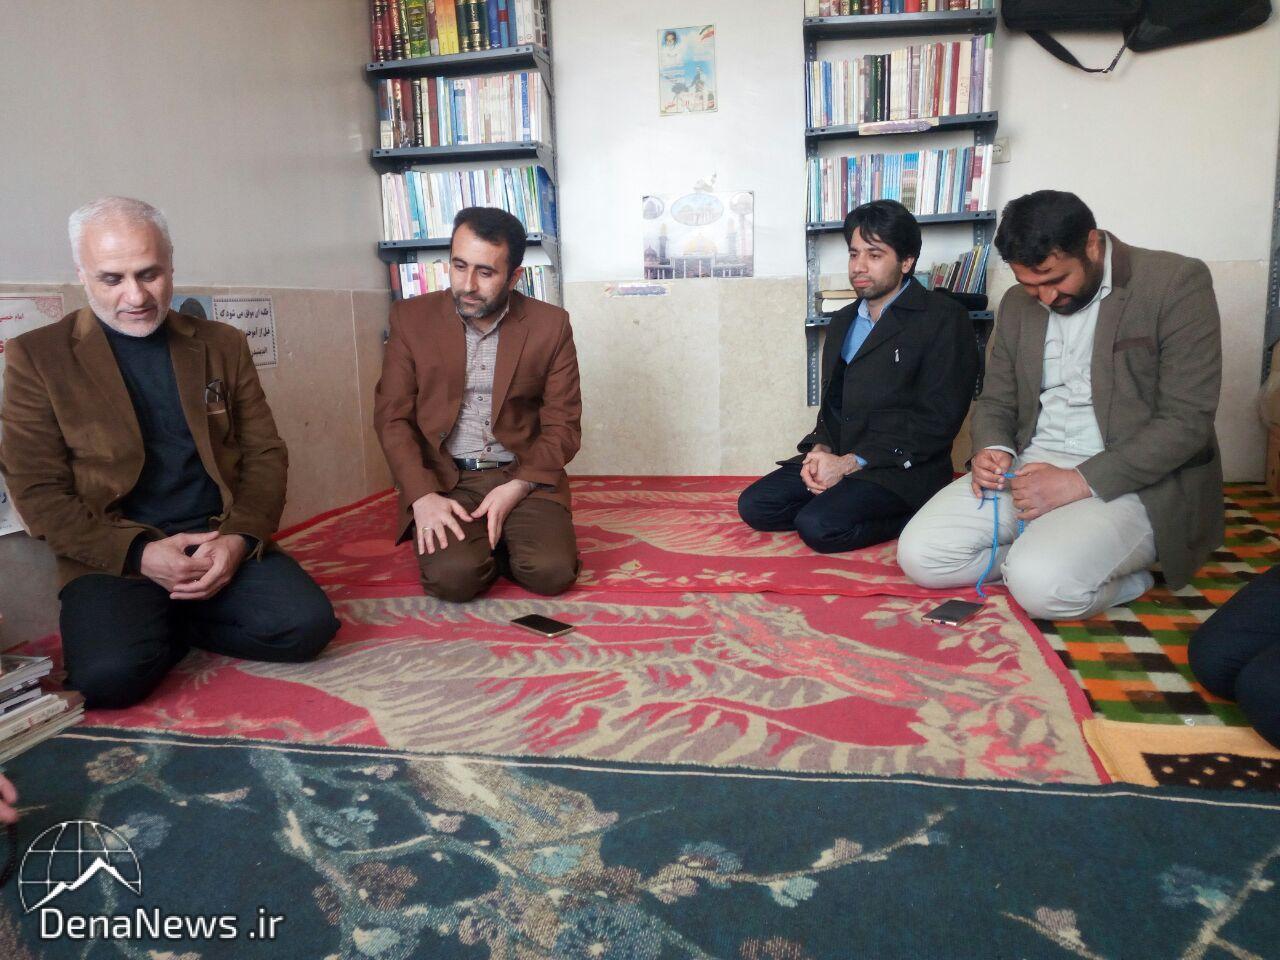 دیدار استاد حسن عباسی با استاد اخلاق حوزه علمیه؛ حجت الاسلام و مسلمین حق جو